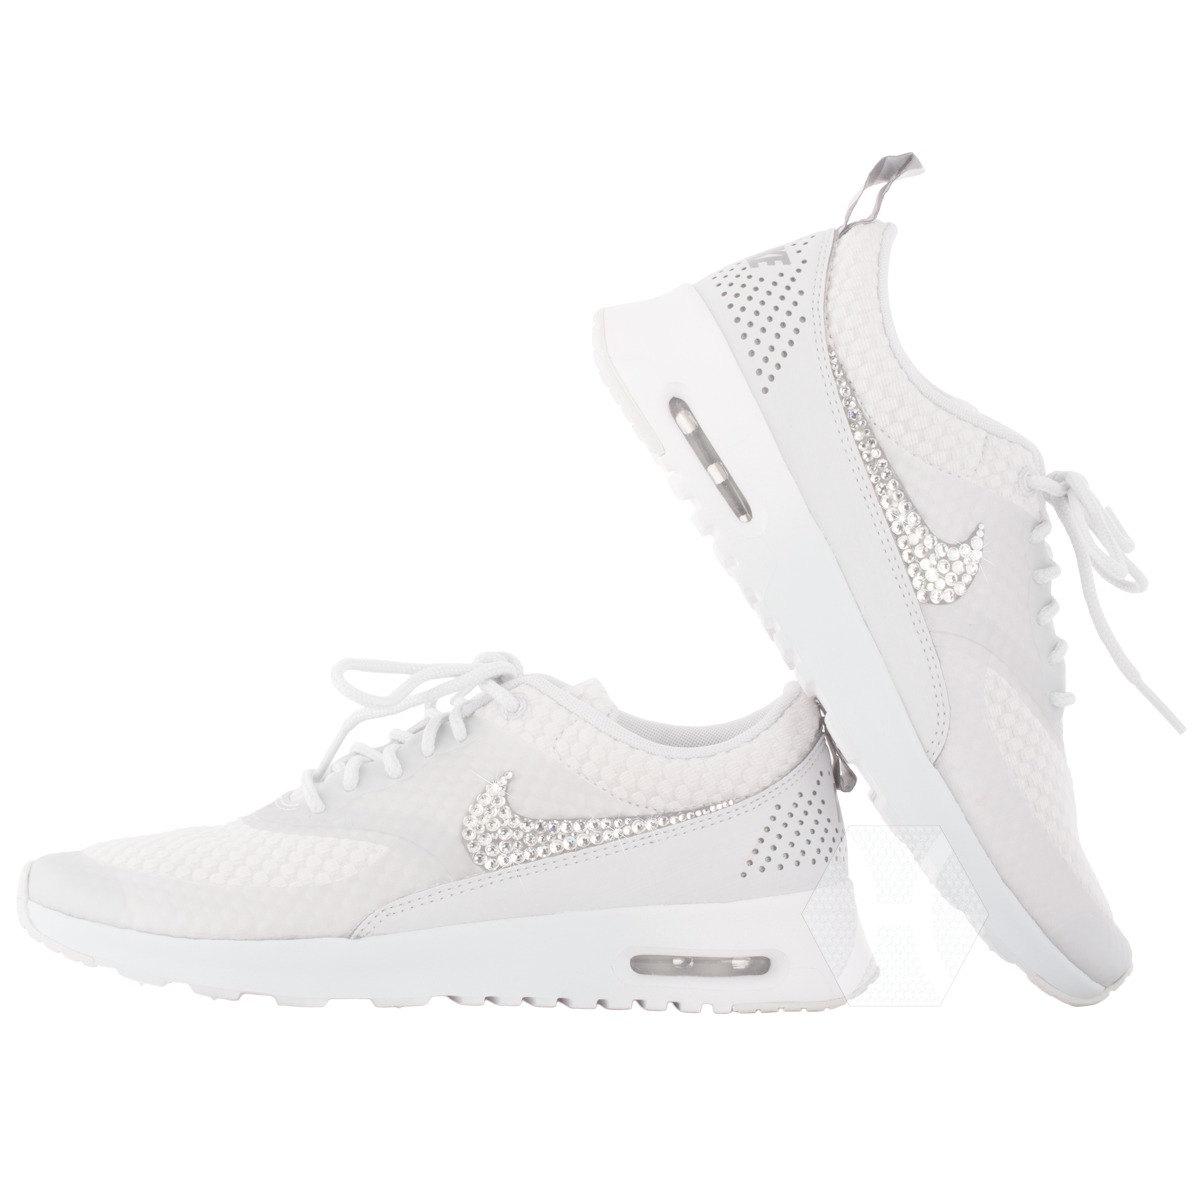 Women's Nike Air Max Thea White + Silver Sneakers NWT